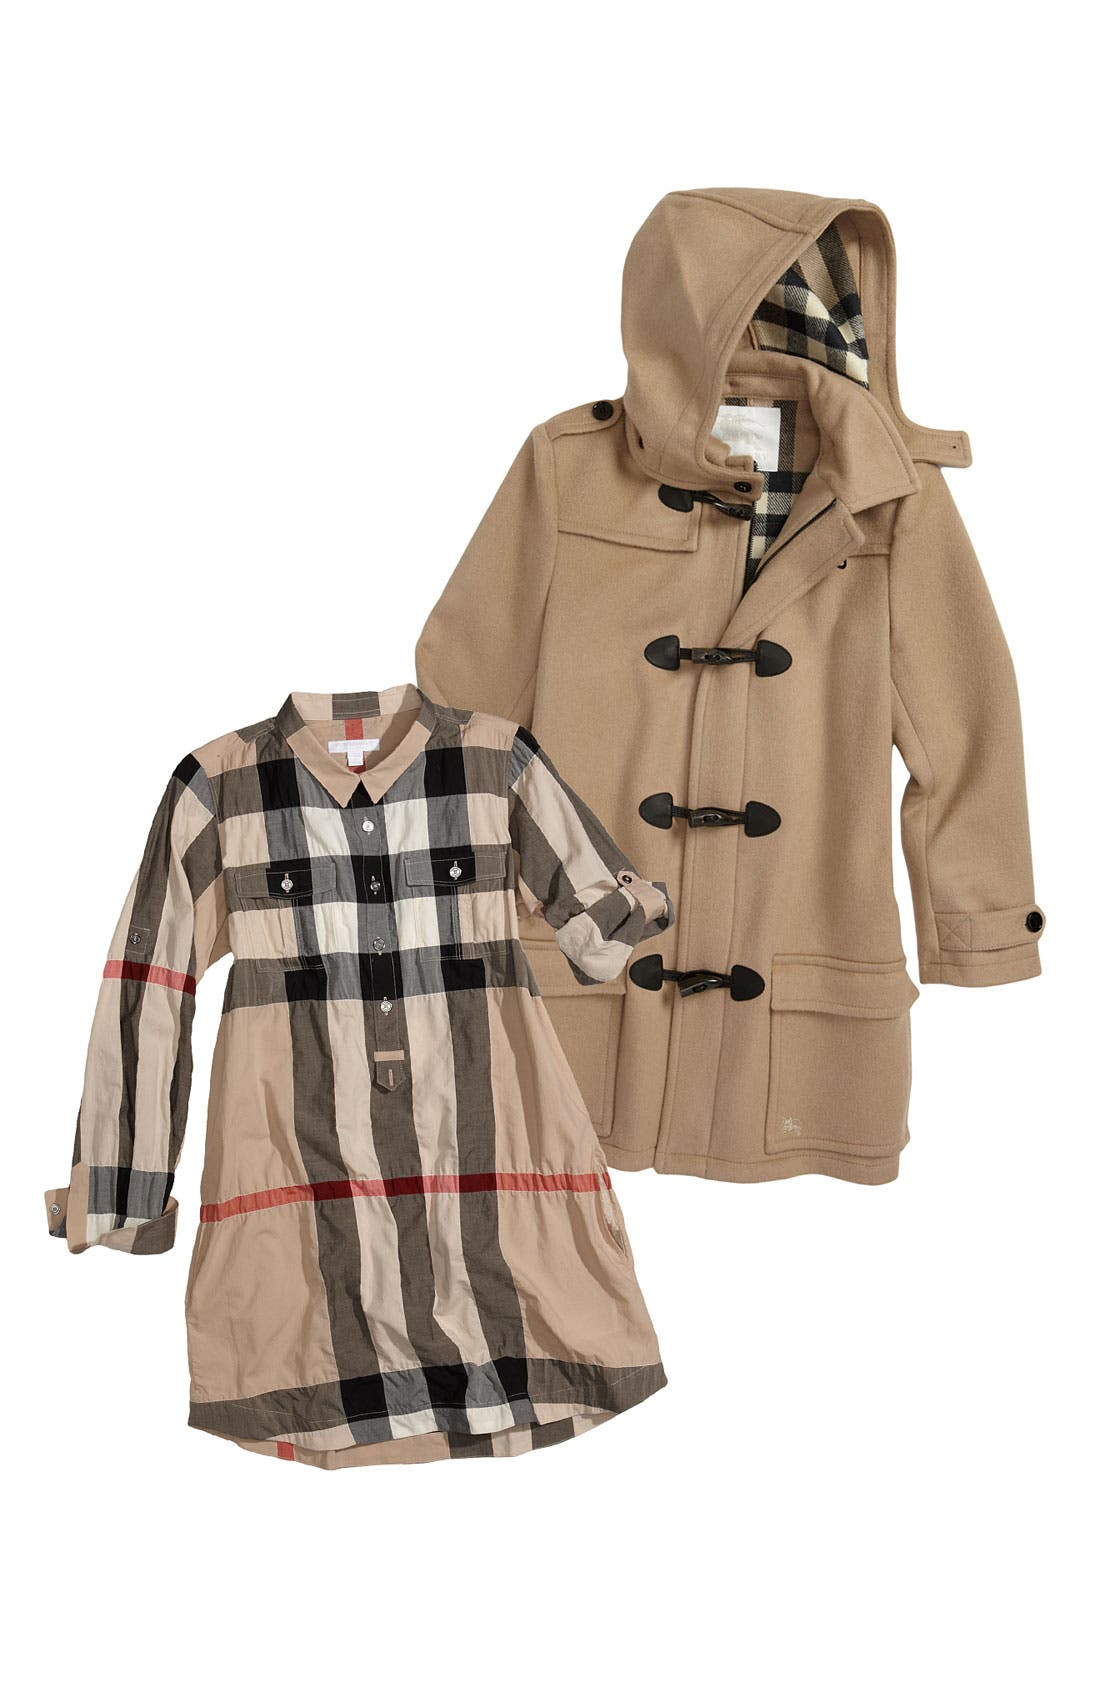 Alternate Image 1 Selected - Burberry Shirtdress & Coat (Big Girls)